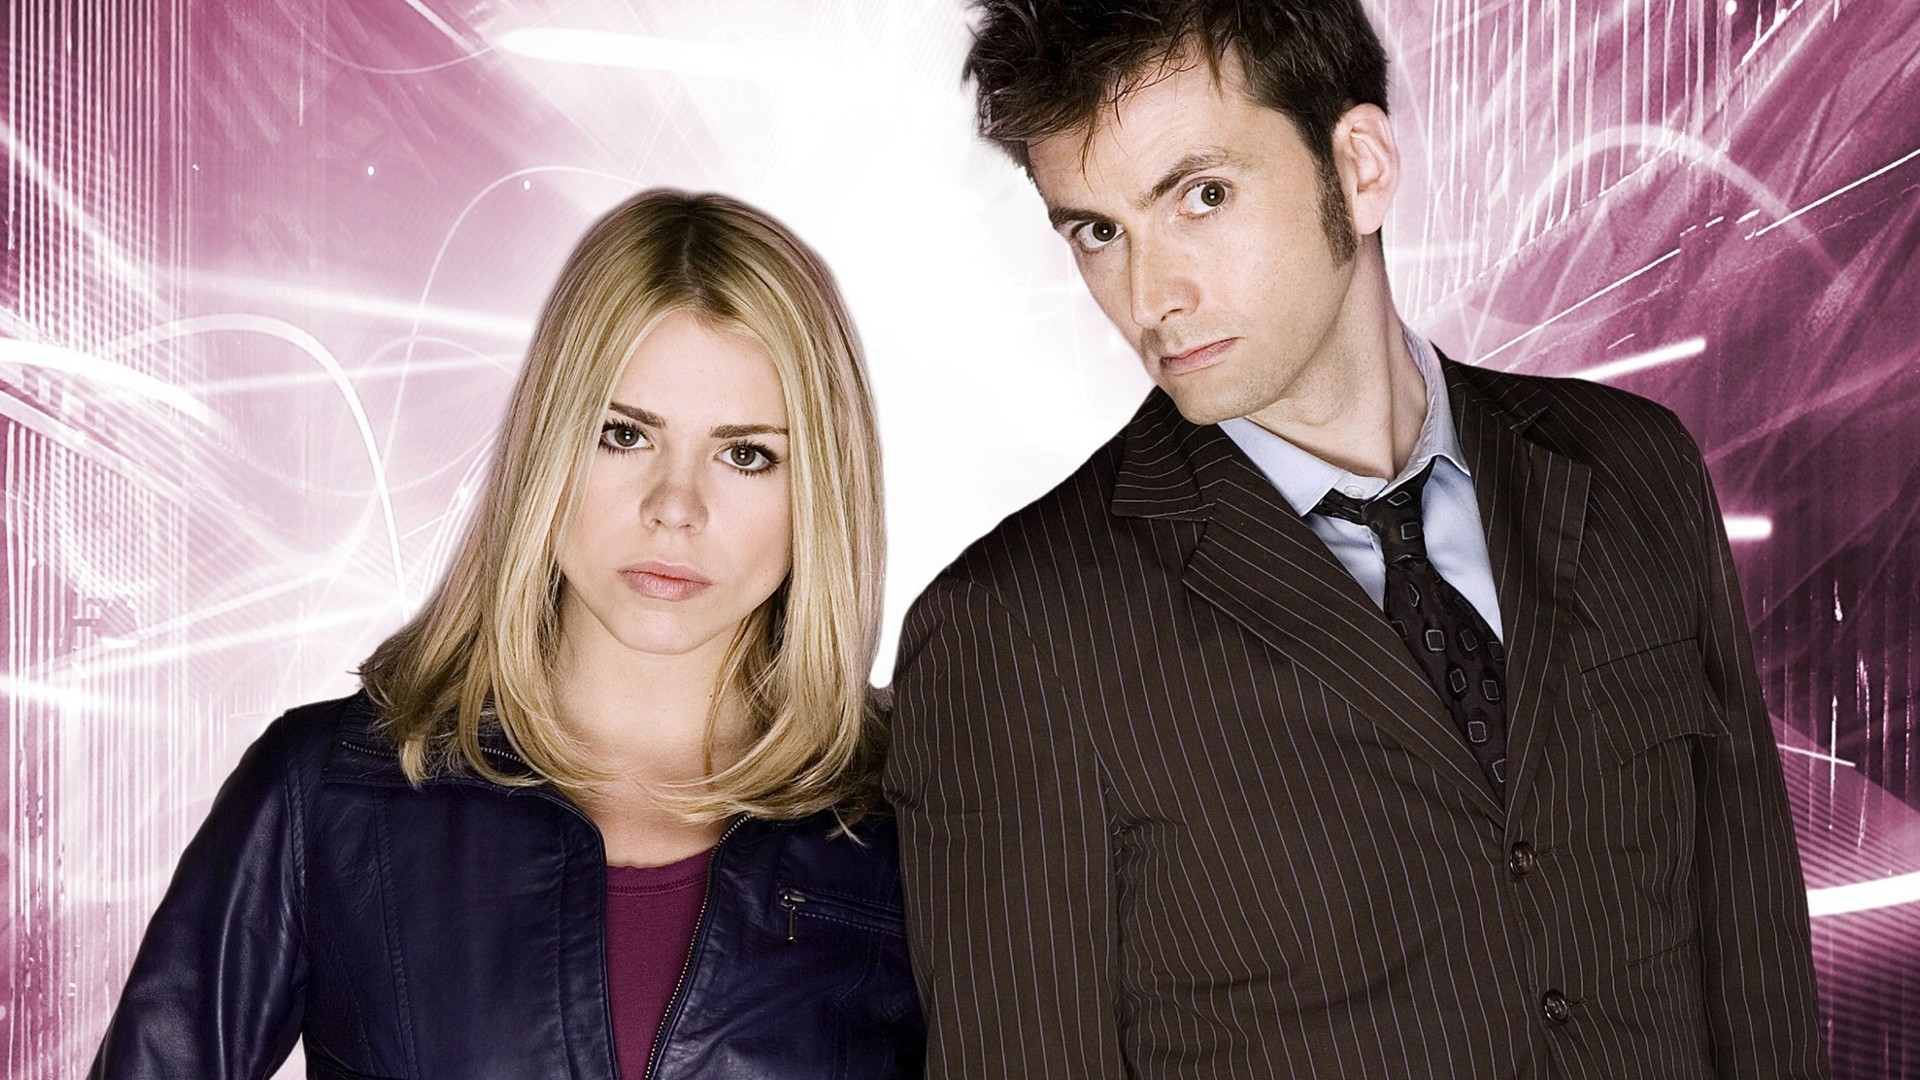 Doctor Who Staffel 6